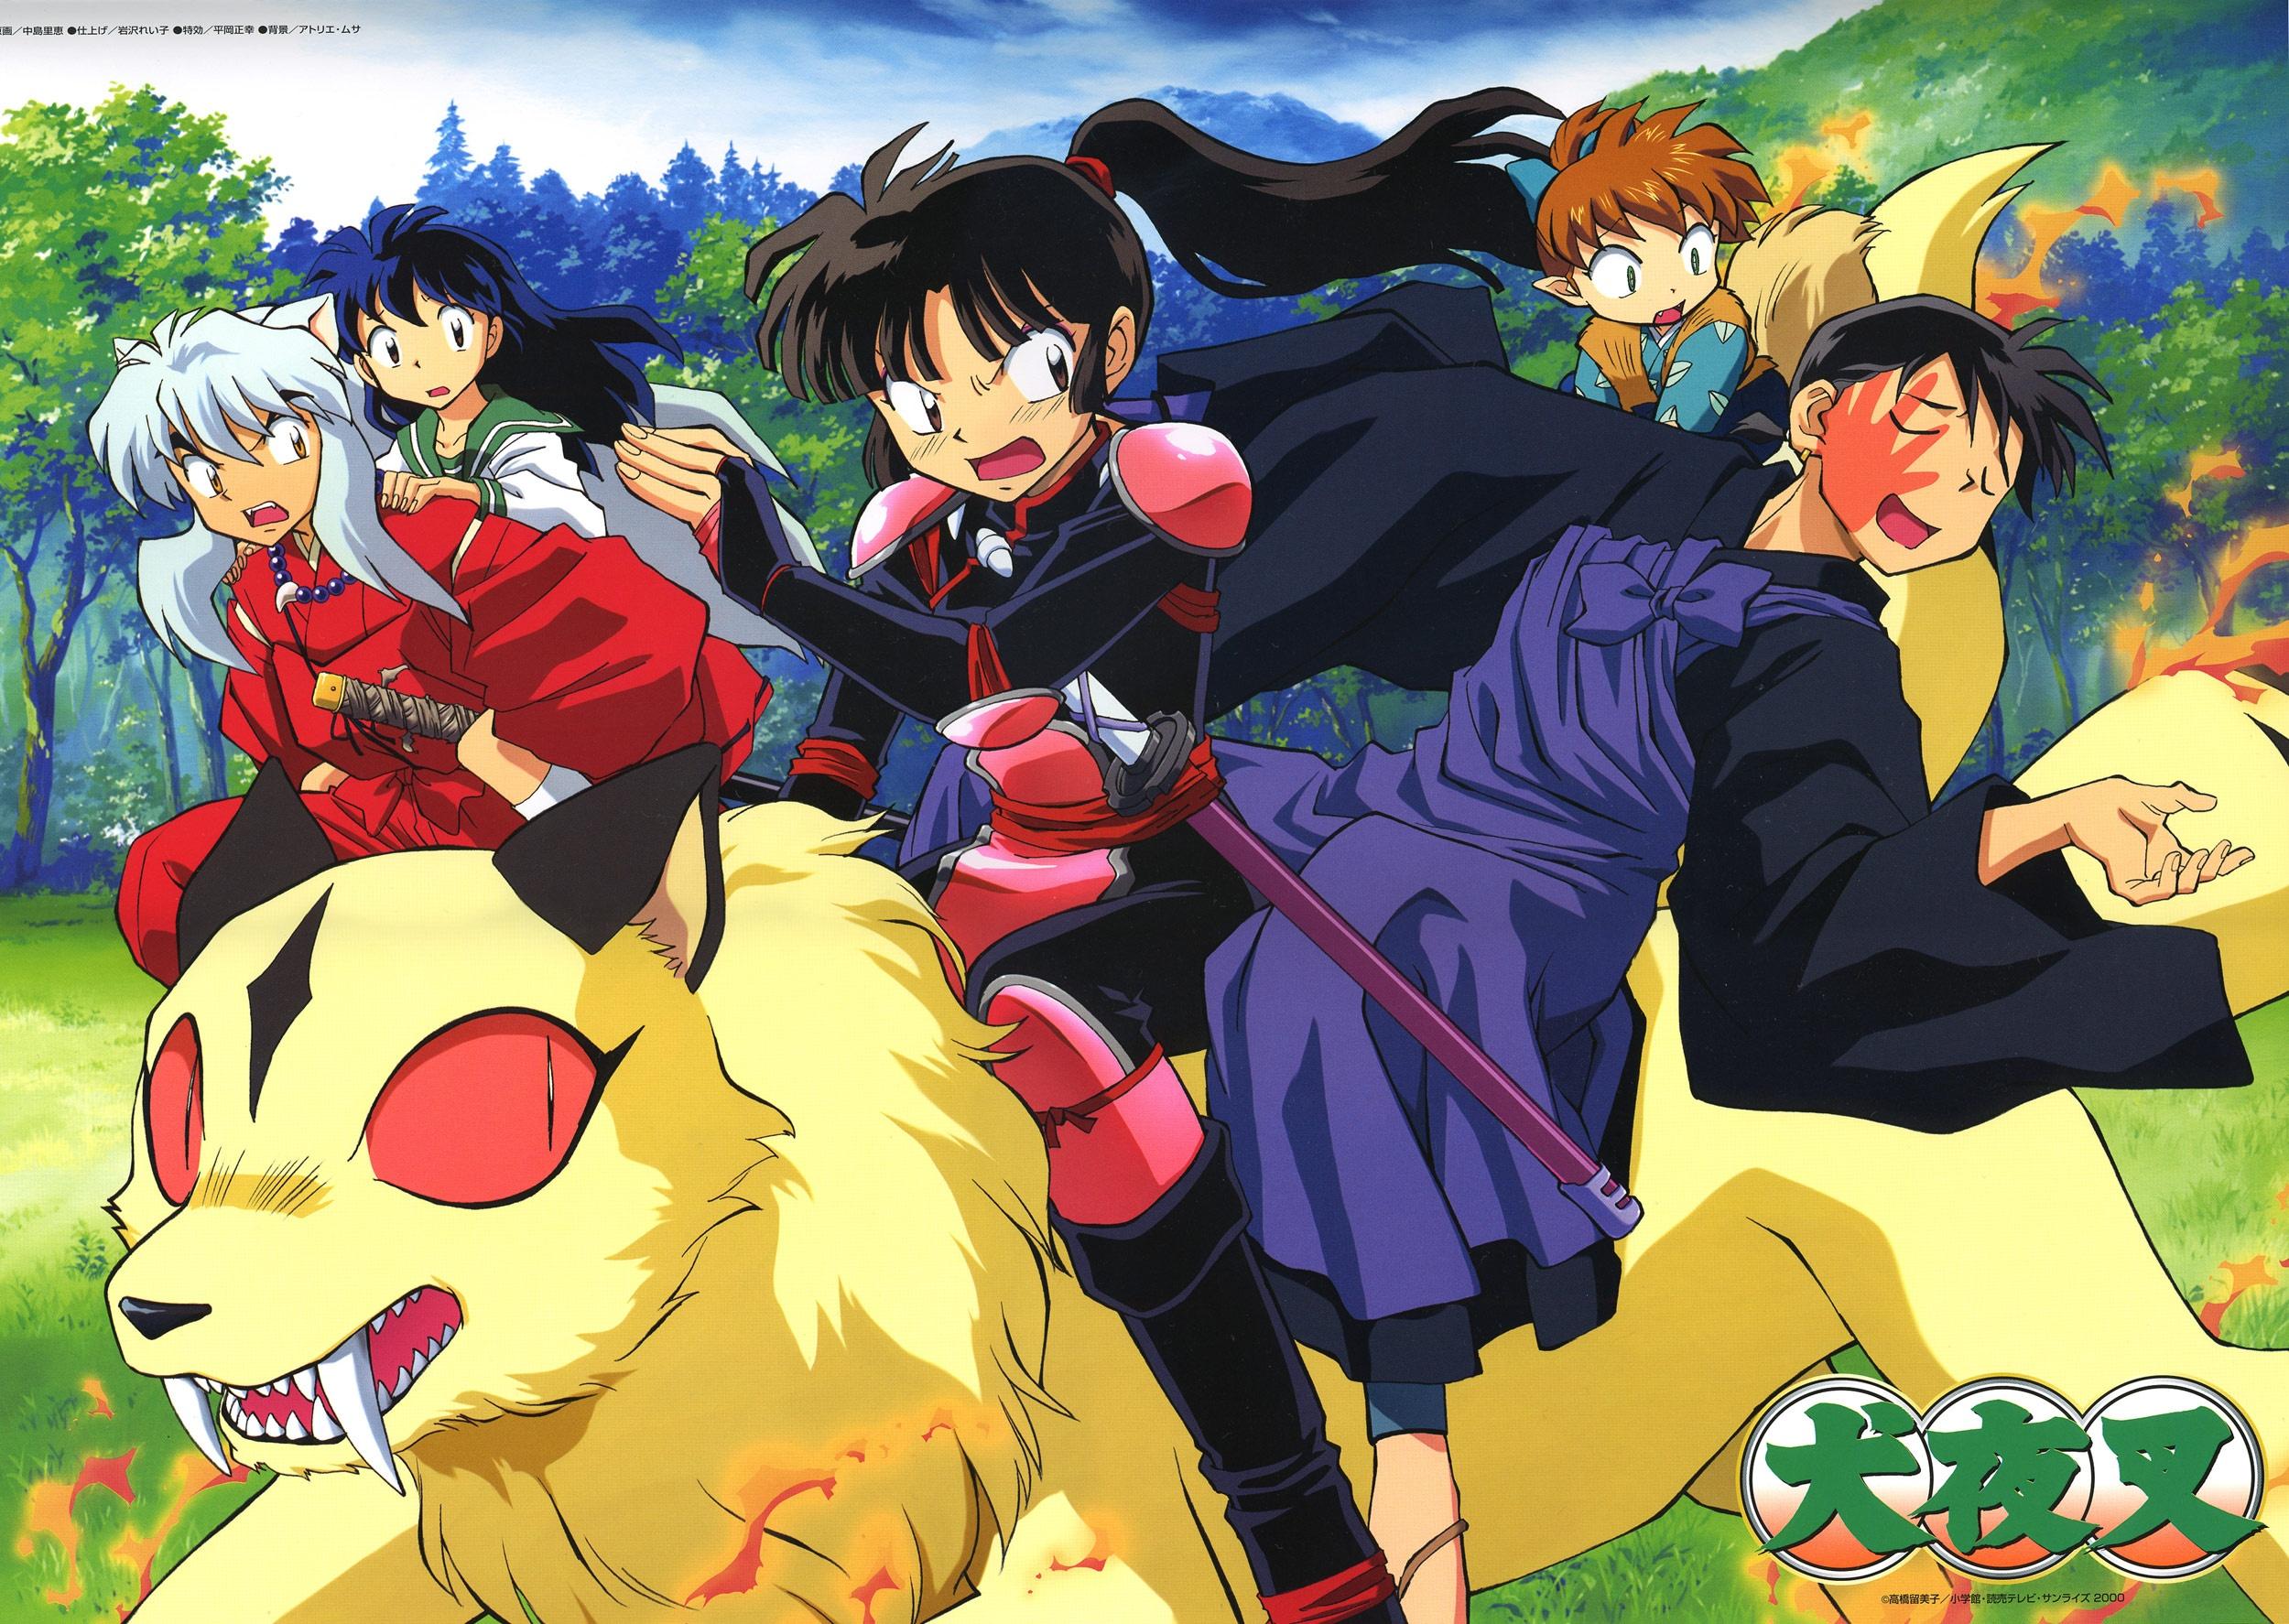 Inuyasha Character Voice Actors Mirai Nikki Anime Watch Online